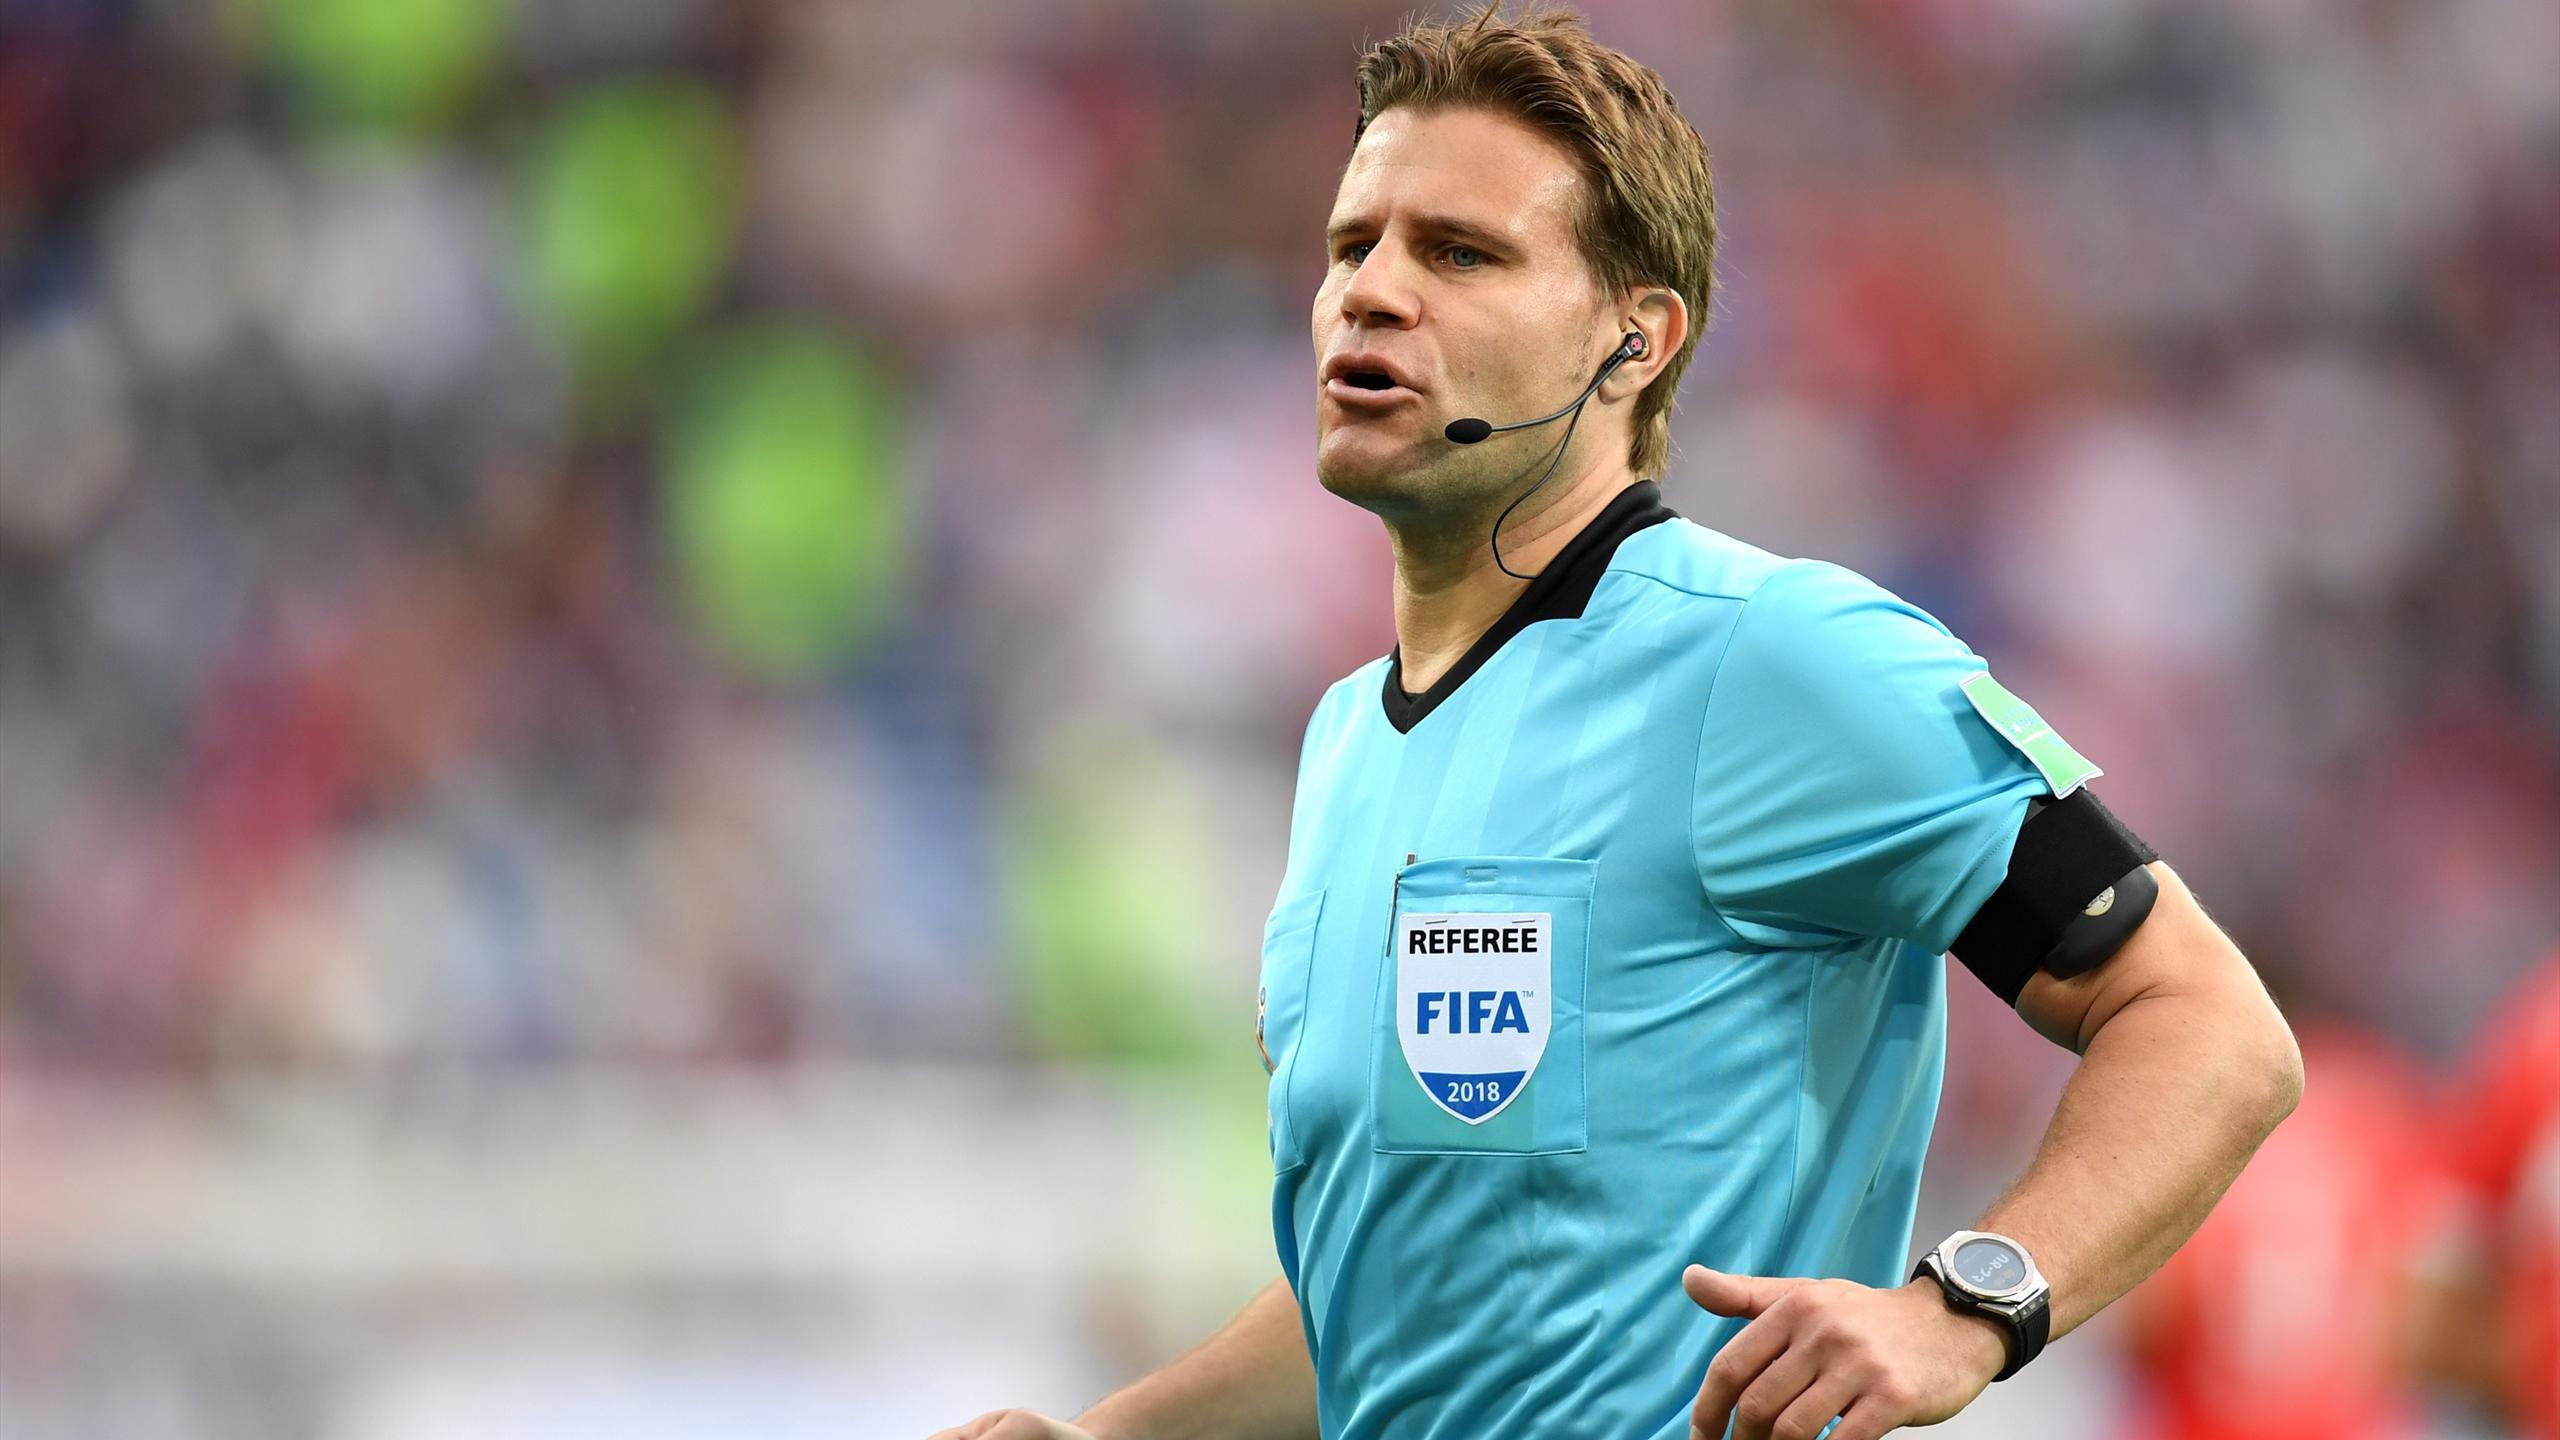 Schiedsrichter Serbien Schweiz